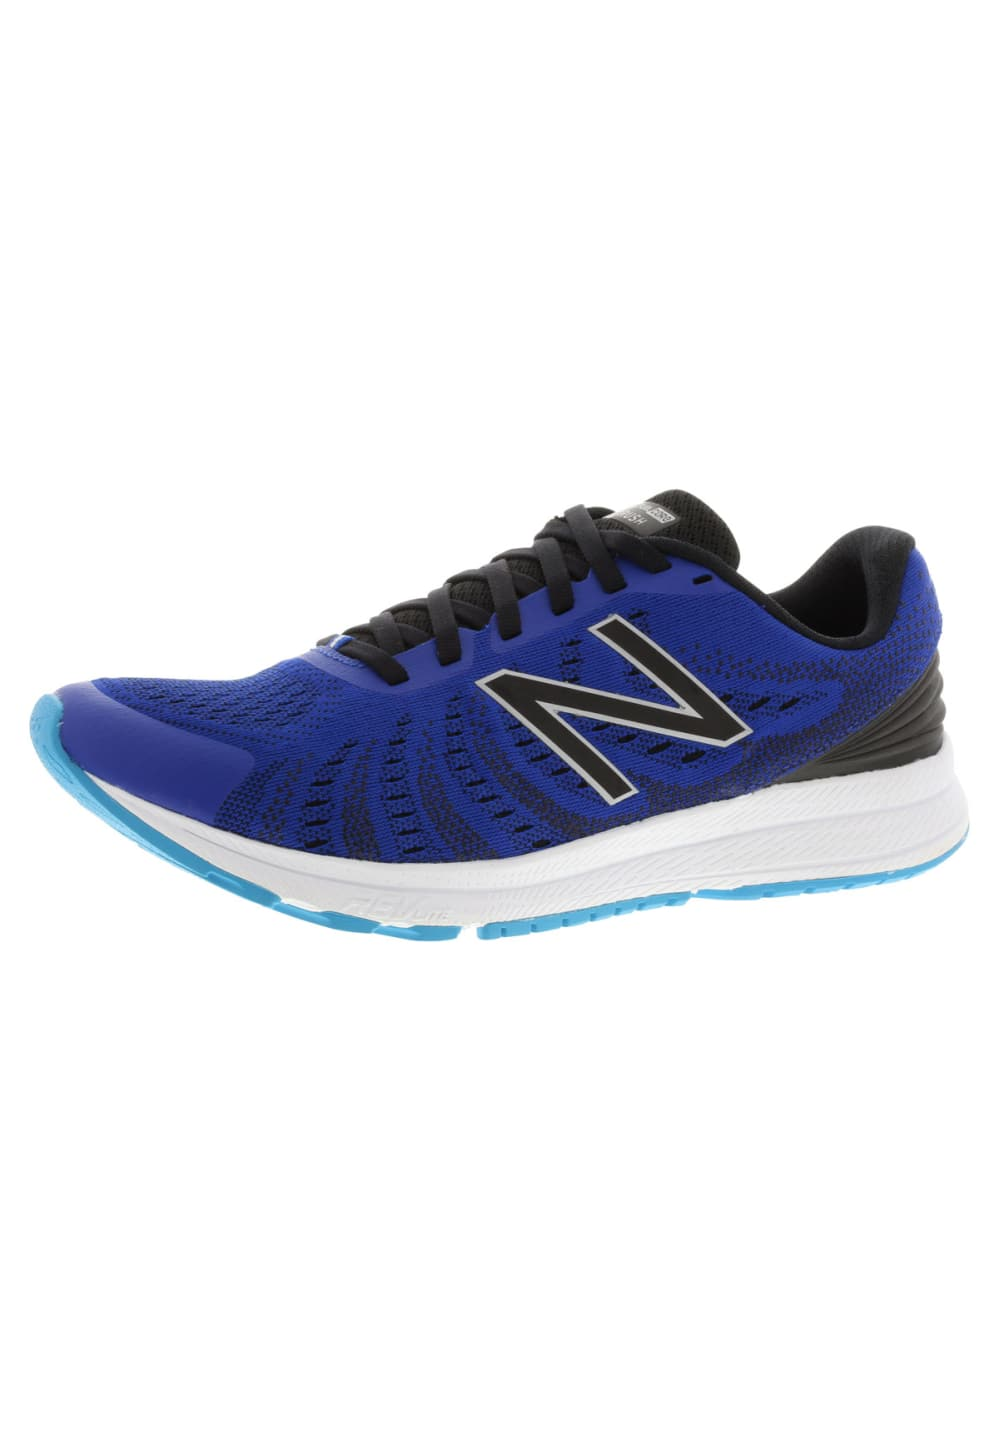 Bleu Vazeerush Homme New Balance 21run Running Chaussures Pour YxwgTqf